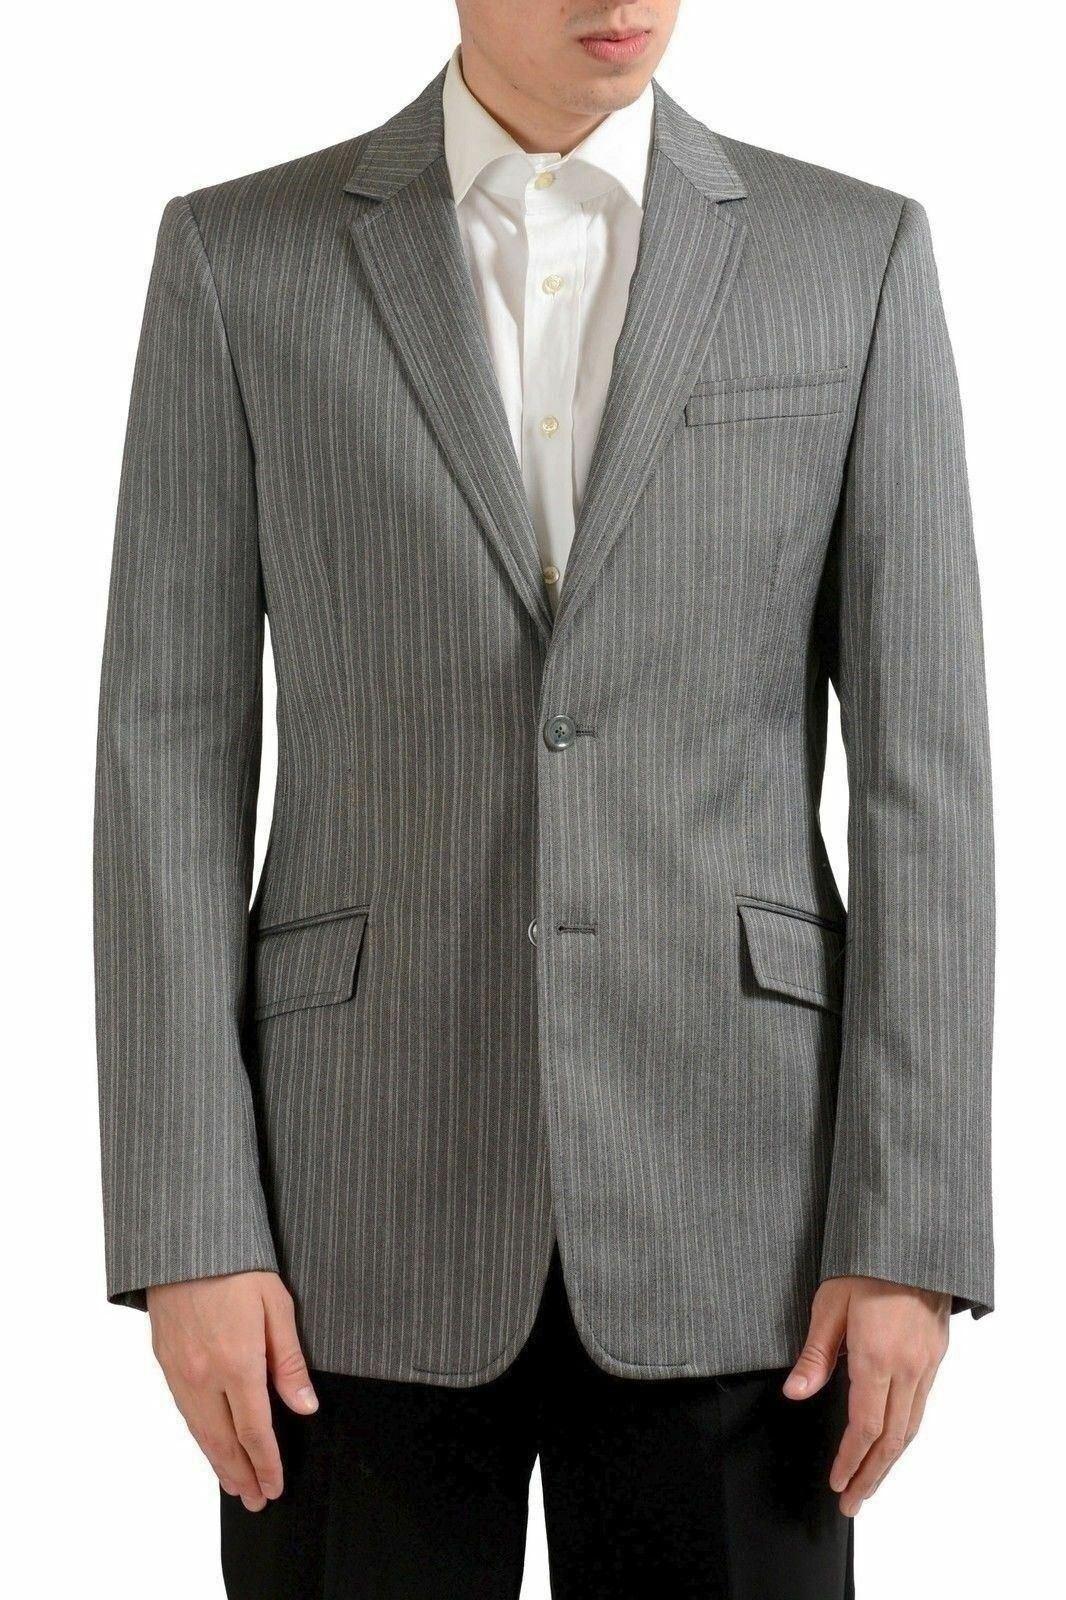 Just Cavalli Men's Wool Two Button Striped Blazer Sport Coat US 40 IT 50